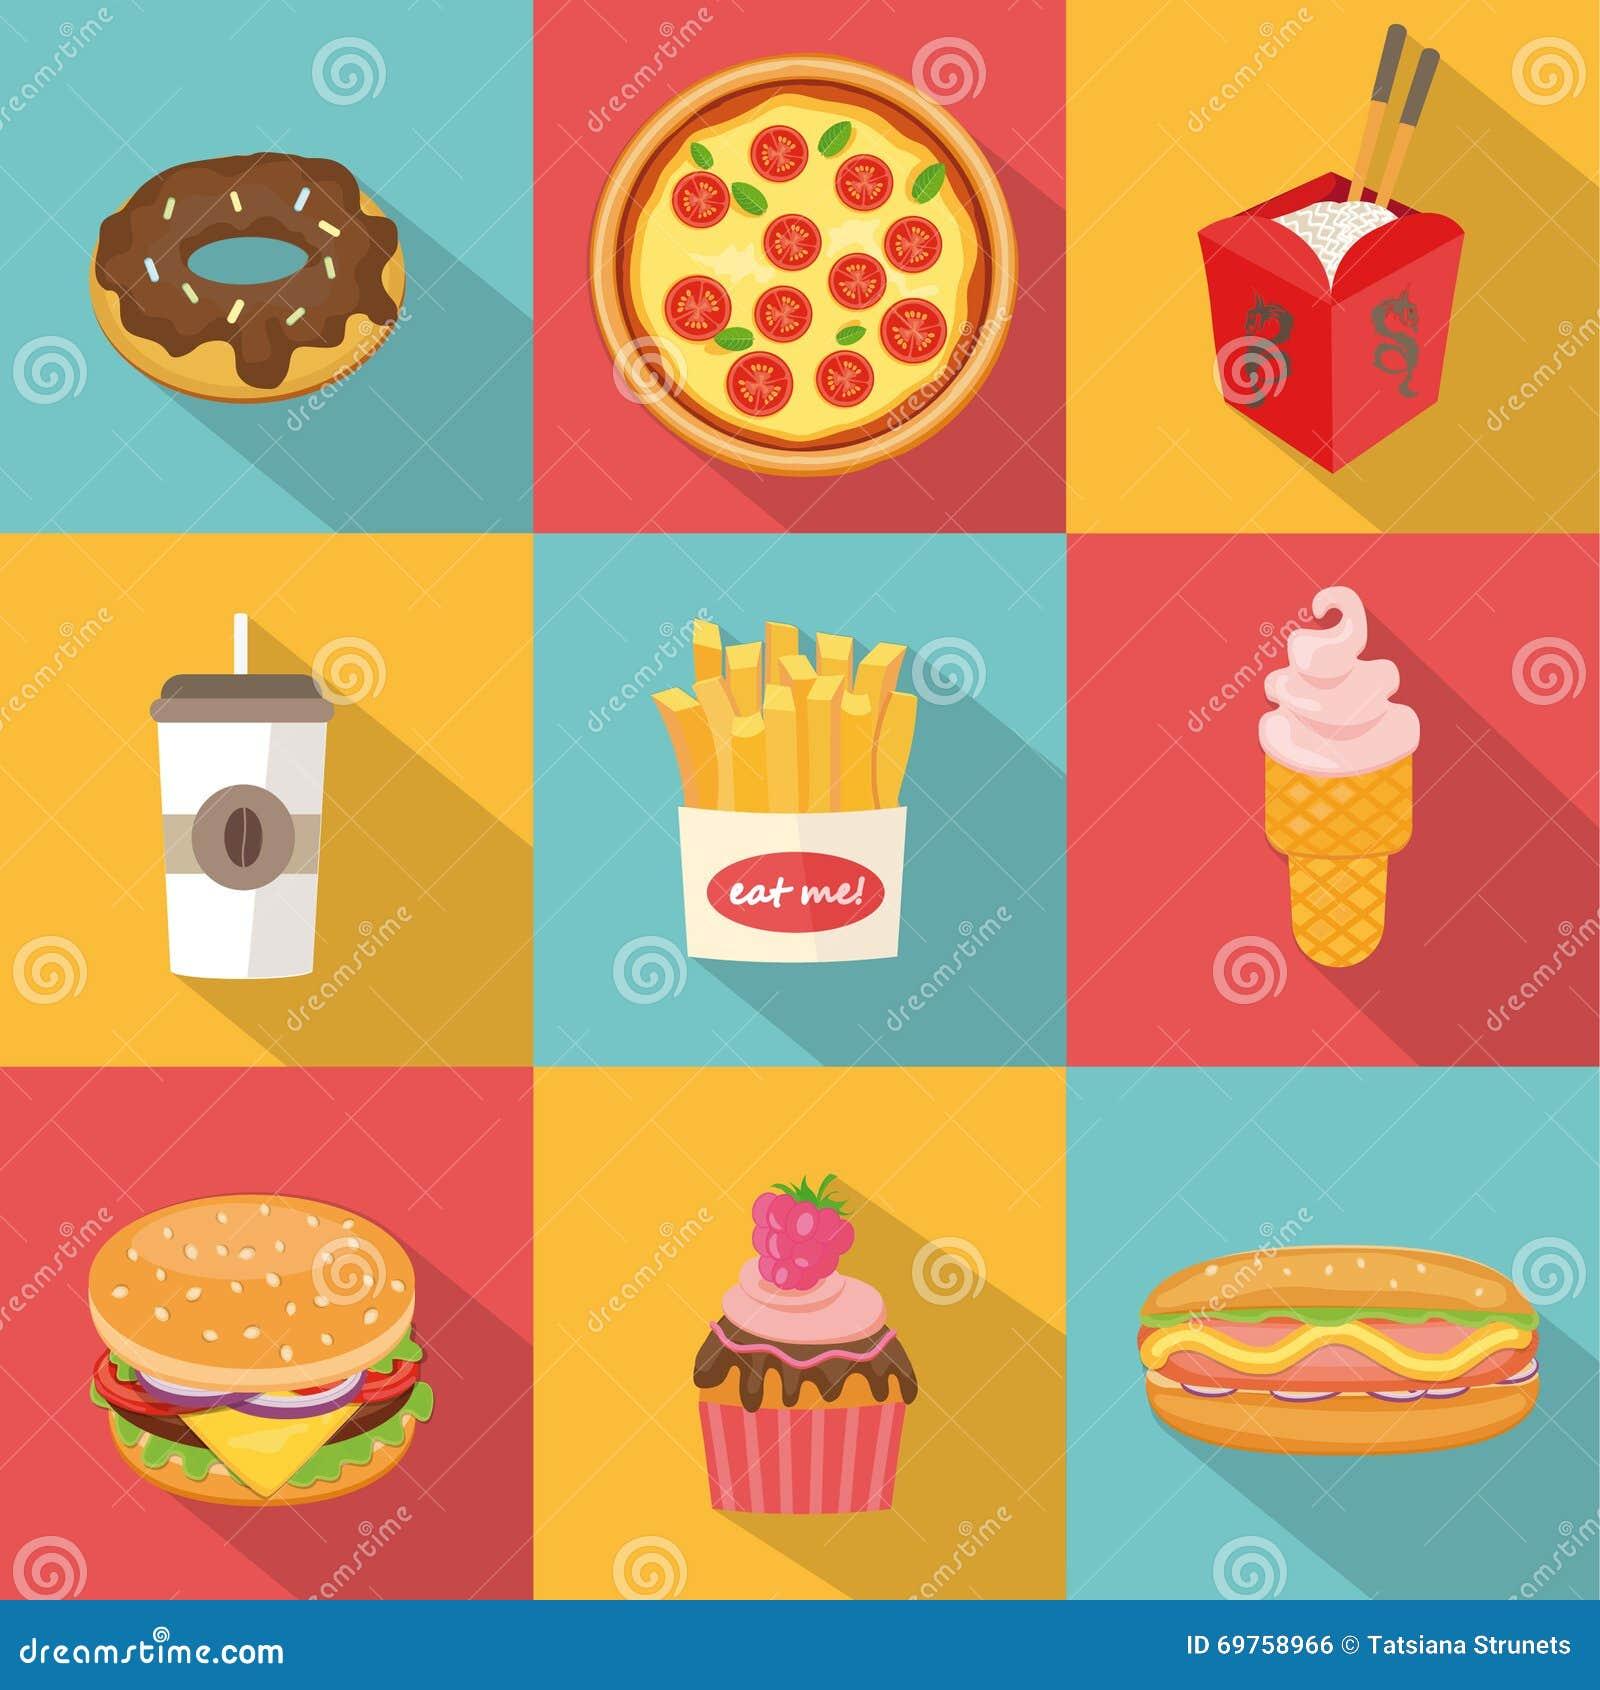 Fast Food Symbols Stock Vector Illustration Of Drinks 69758966